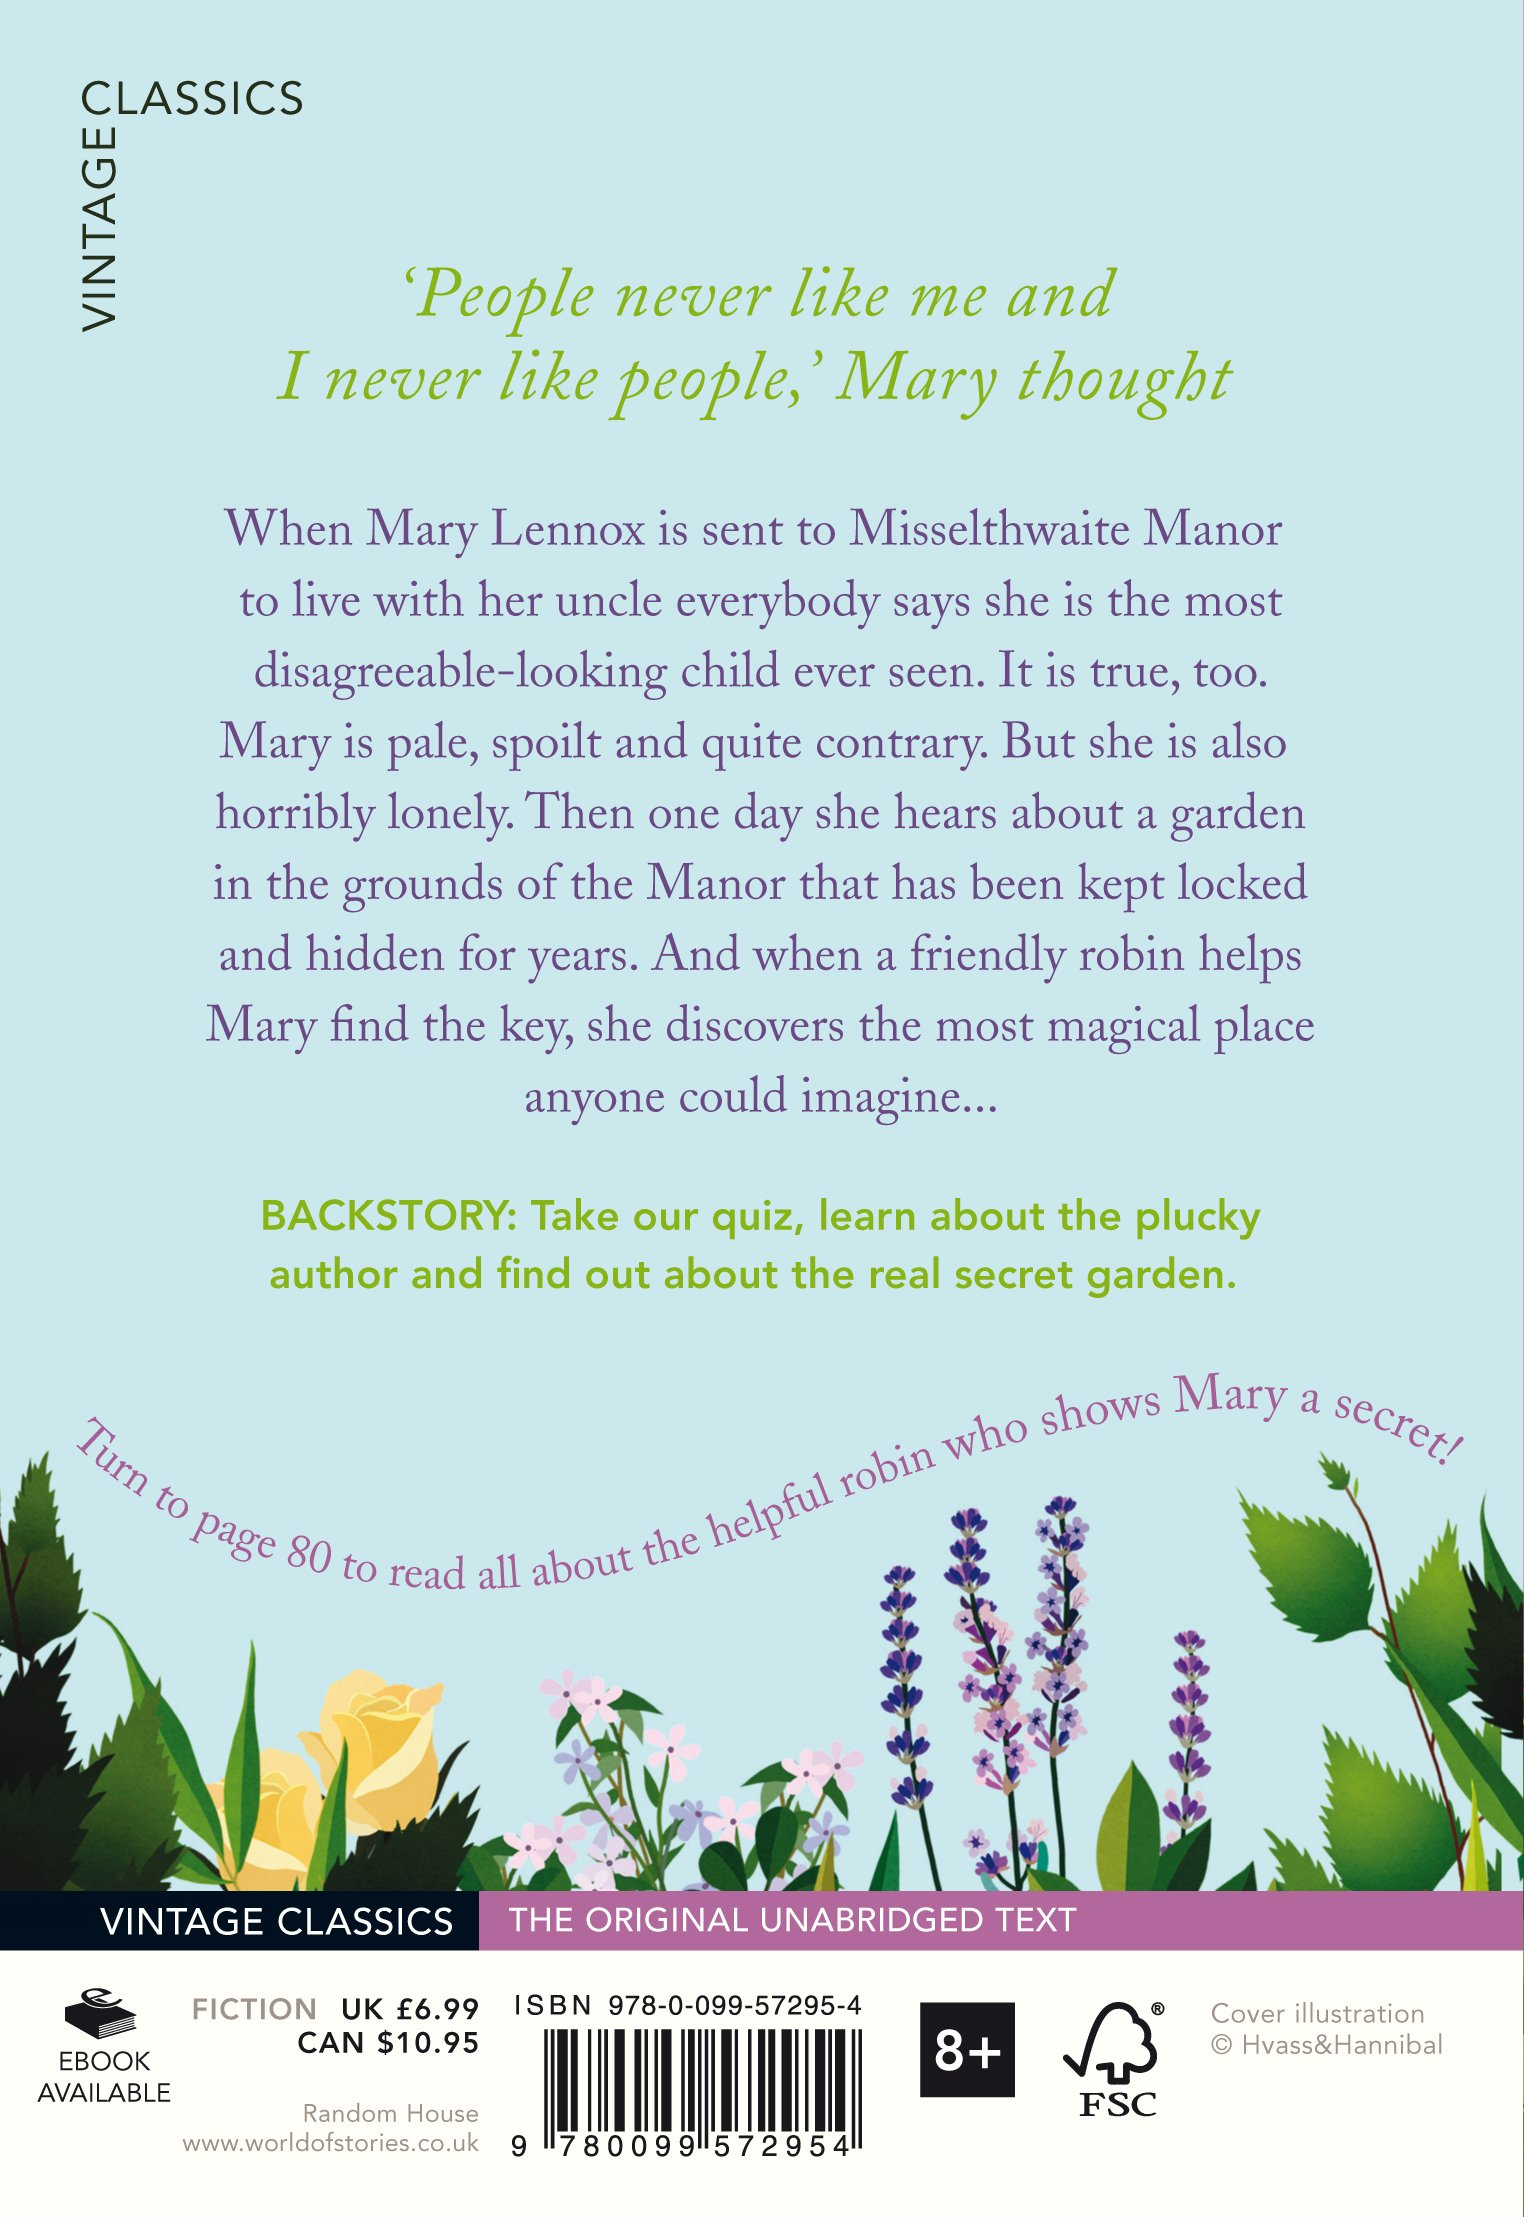 The Secret Garden (Vintage Childrens Classics): Amazon.es: Frances Hodgson Burnett: Libros en idiomas extranjeros